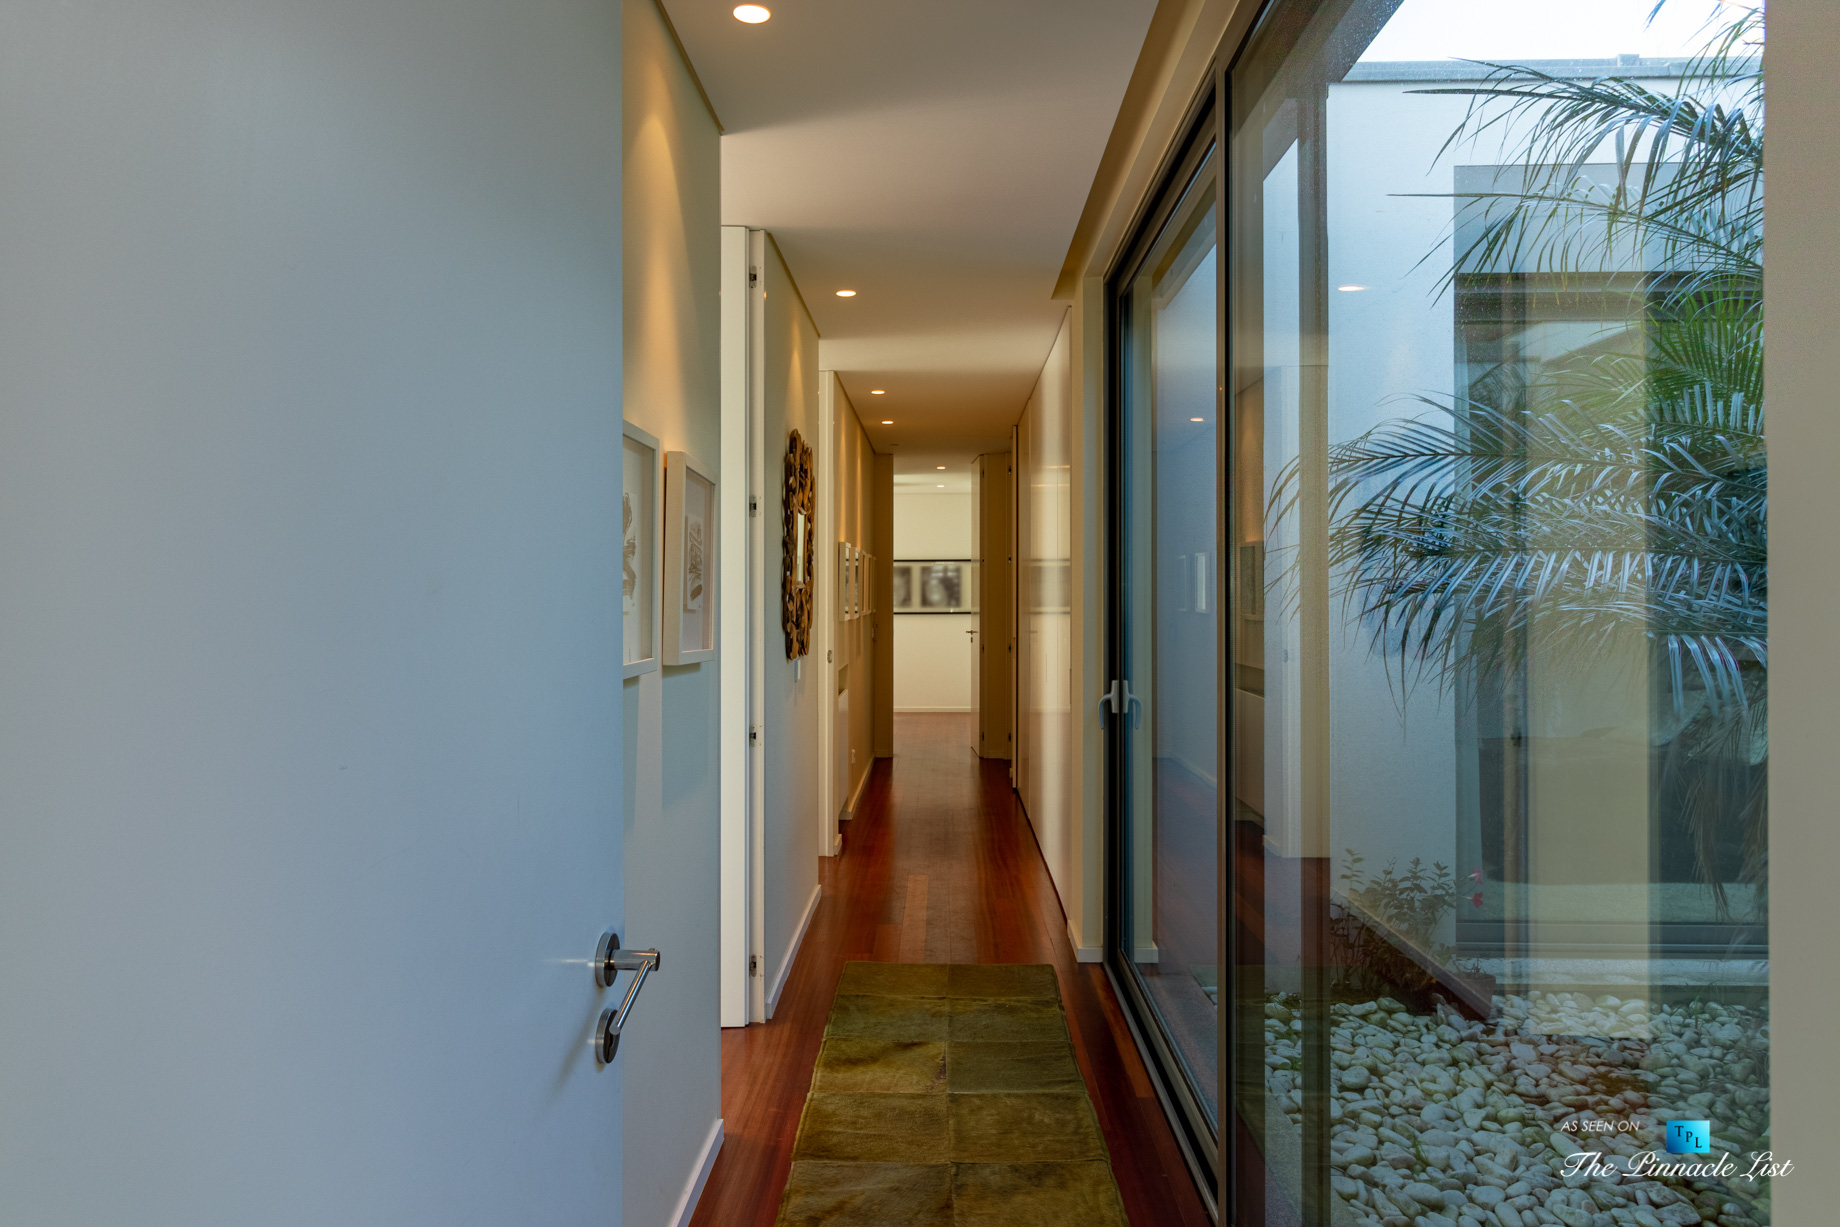 Francelos Beach Luxury T5 Villa - Porto, Portugal - Hallway - Luxury Real Estate – Modern Home